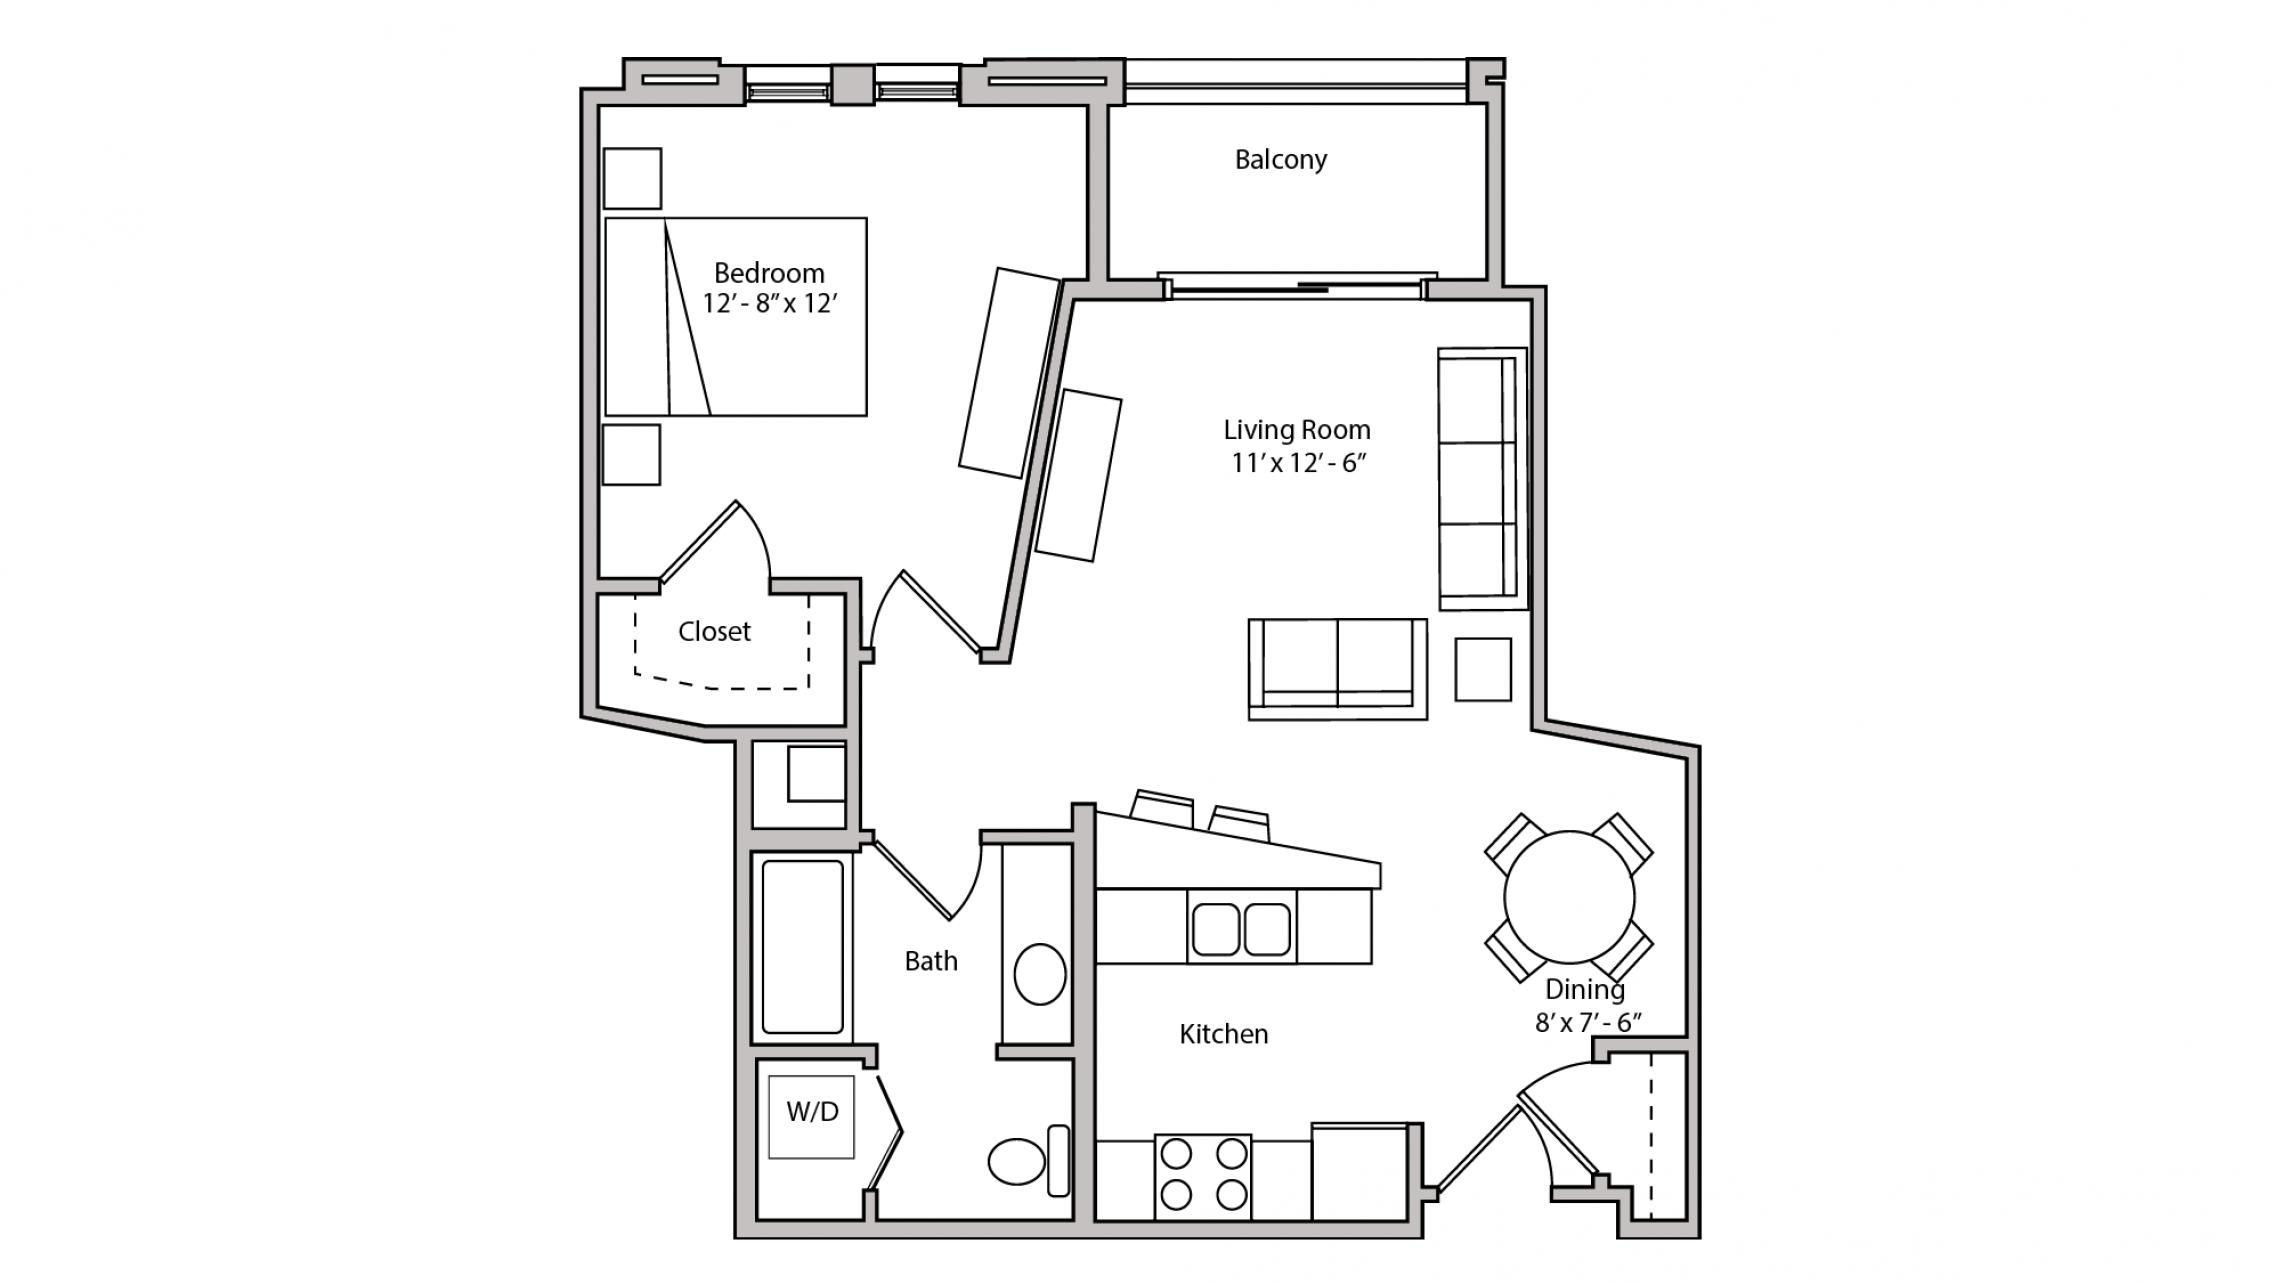 ULI The Depot 1-509 - One Bedroom, One Bathroom